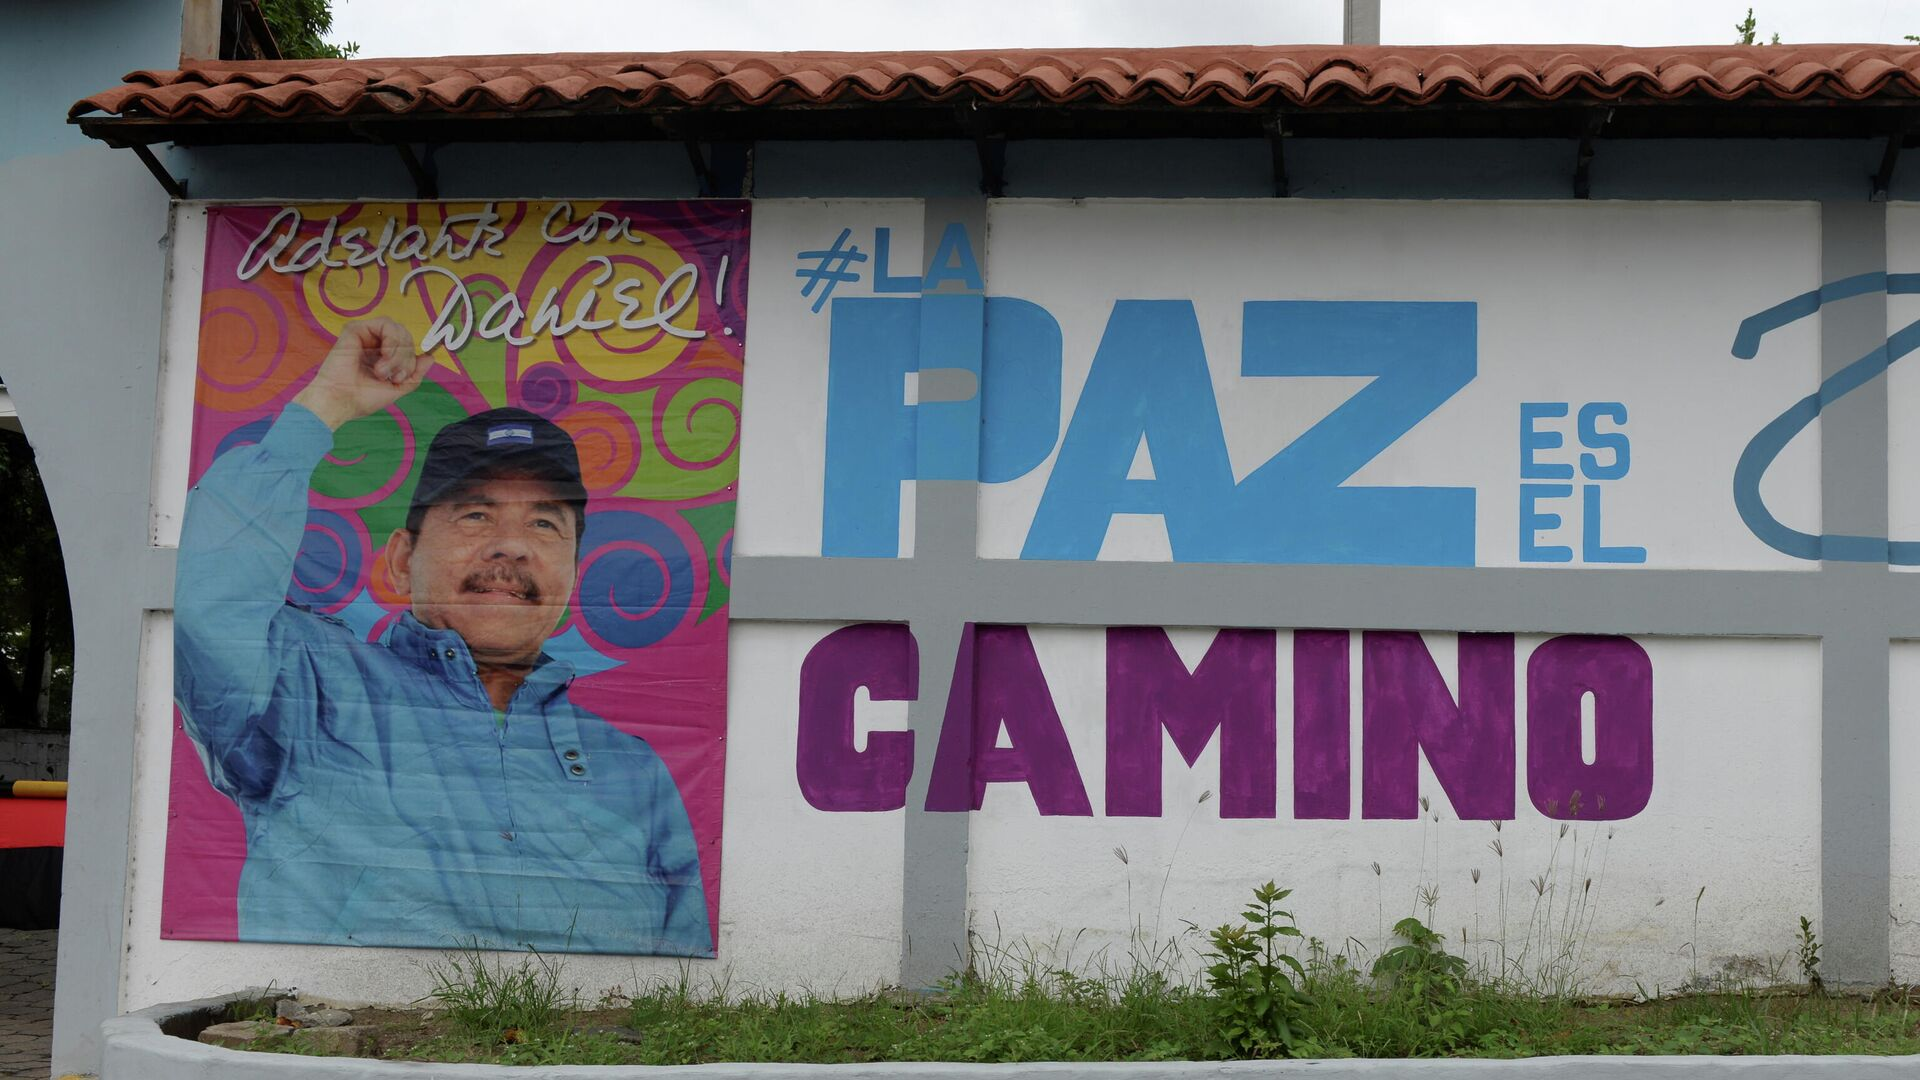 Un muro con el retrato de Daniel Ortega - Sputnik Mundo, 1920, 09.07.2021